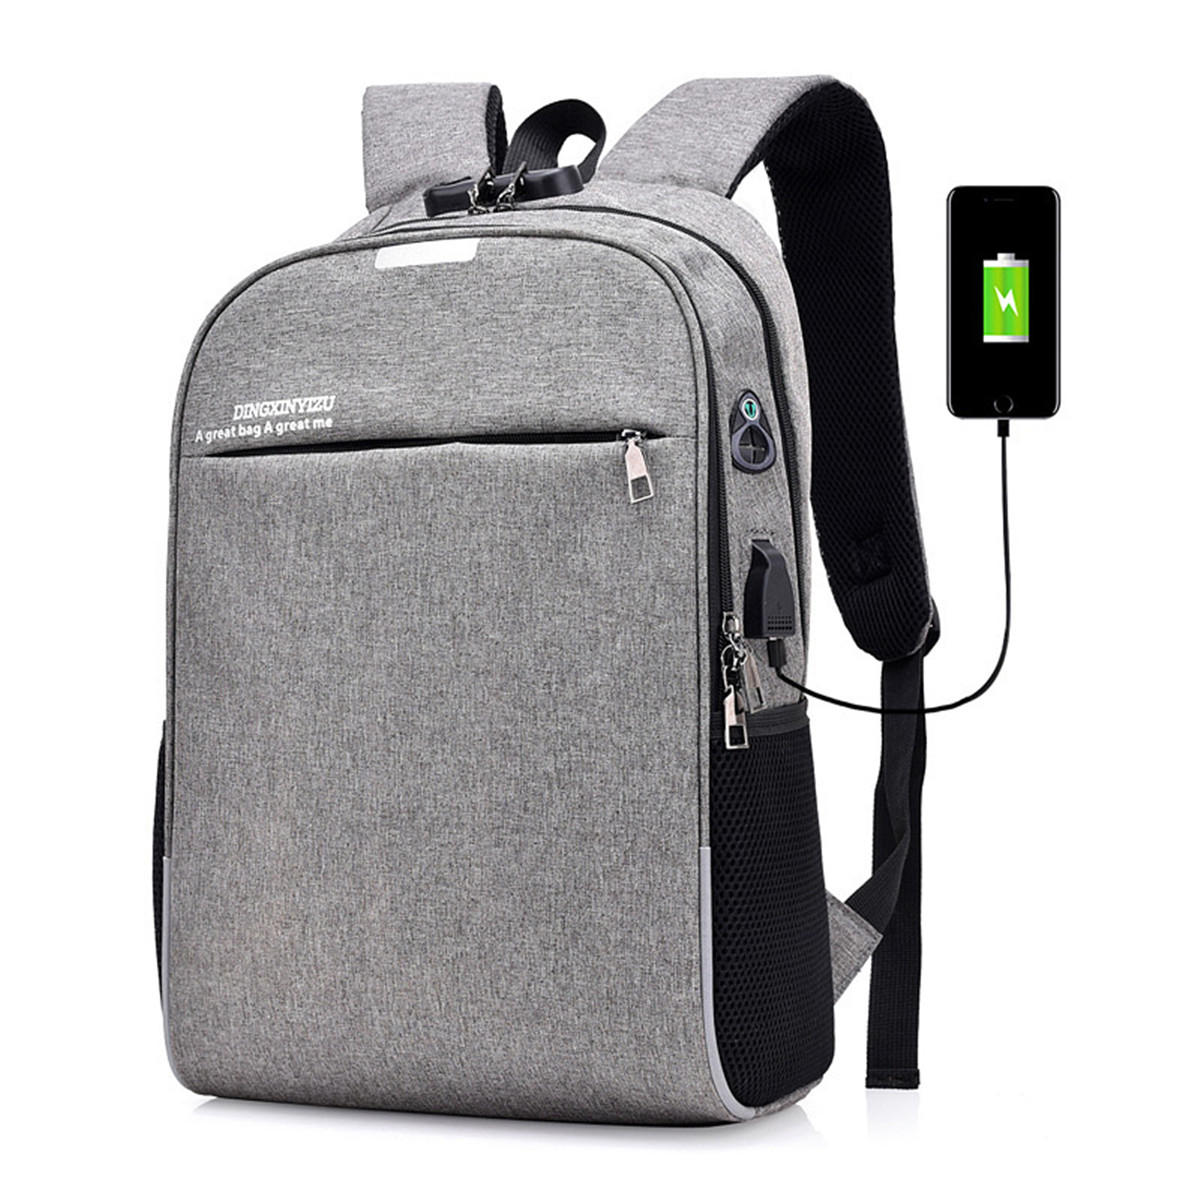 69d3377c9a4 20L Anti-theft Men Laptop Notebook Backpack USB Charging Port School Bag  With Password Lock - Black COD